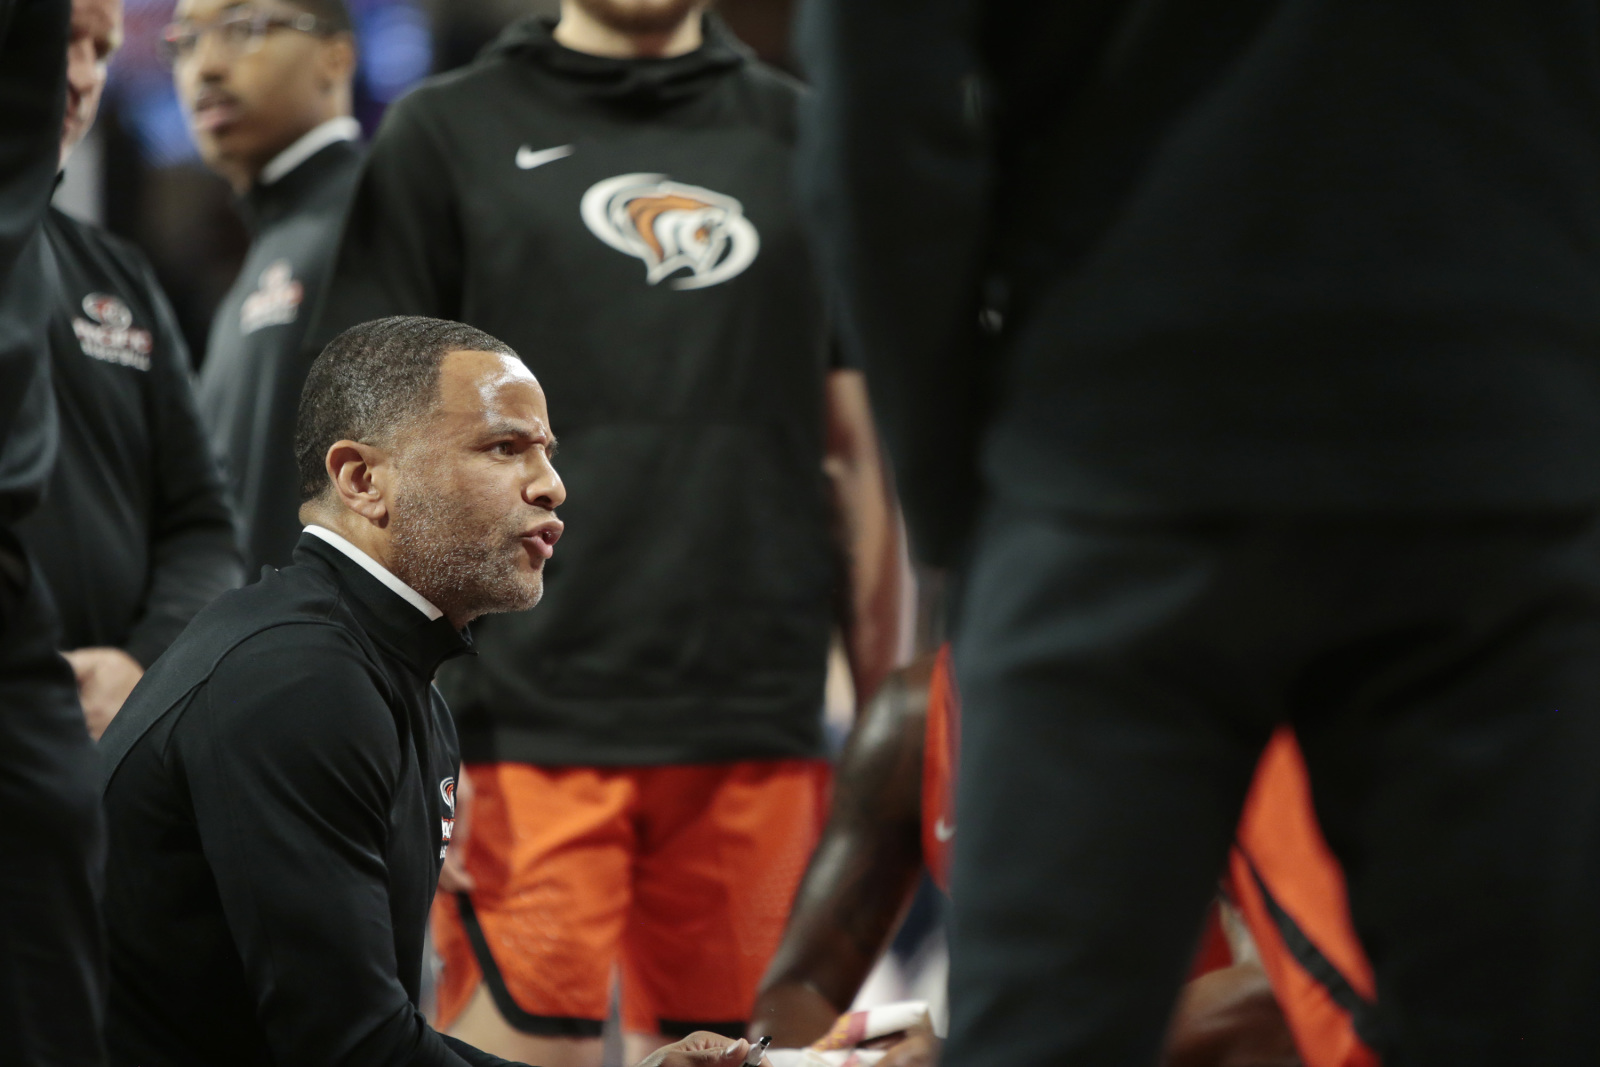 NCAA Basketball Recruiting: Analyzing JUCO prospect Saquan Singleton's top-5